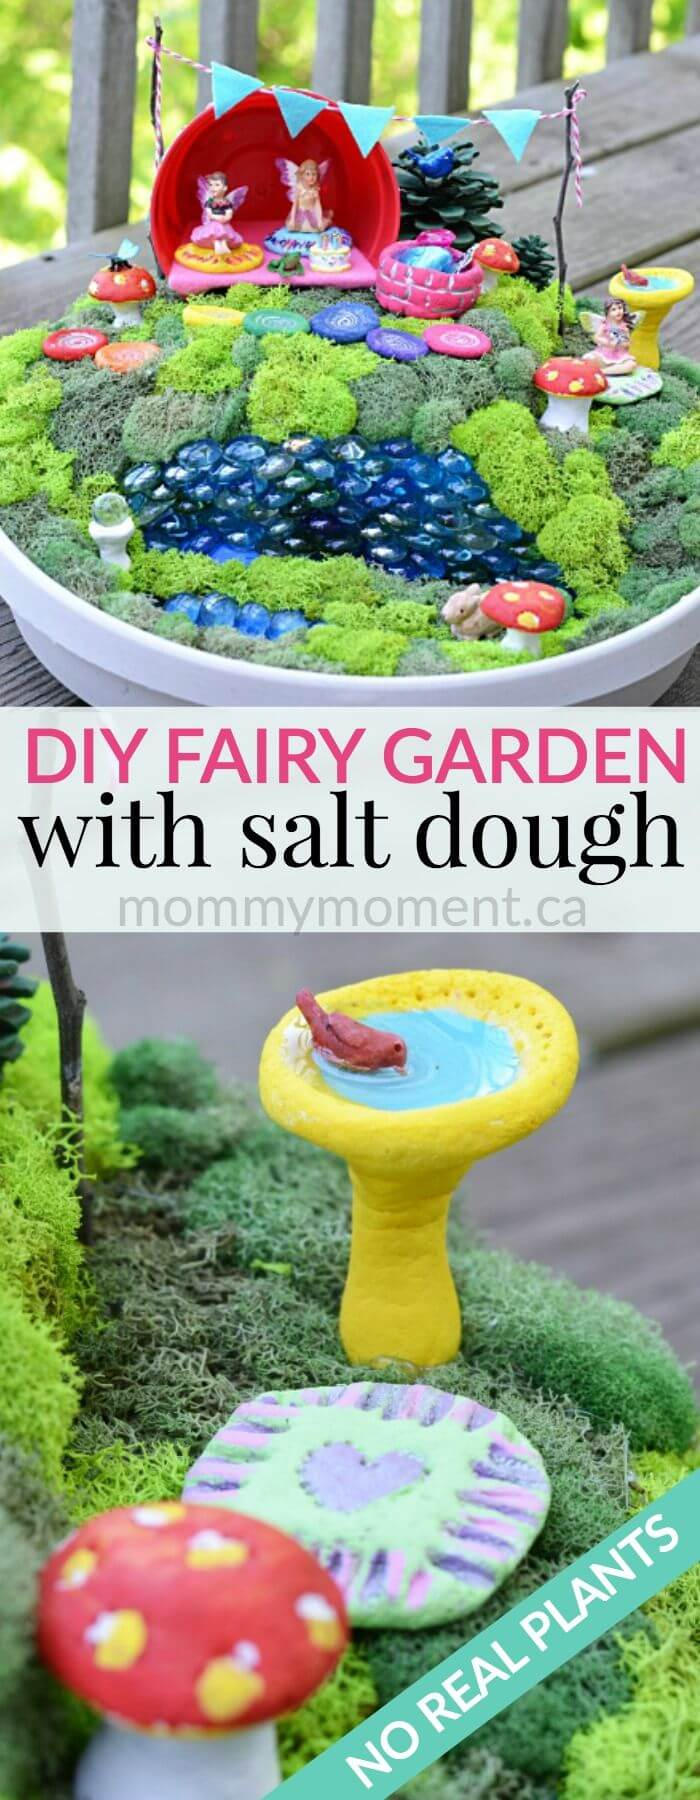 Sturdy Salty Salt Dough Fairy Accessories Diy Fairy Garden Accessories Ideas Designs 2018 Homemade Fairy Garden Items garden Homemade Fairy Garden Items